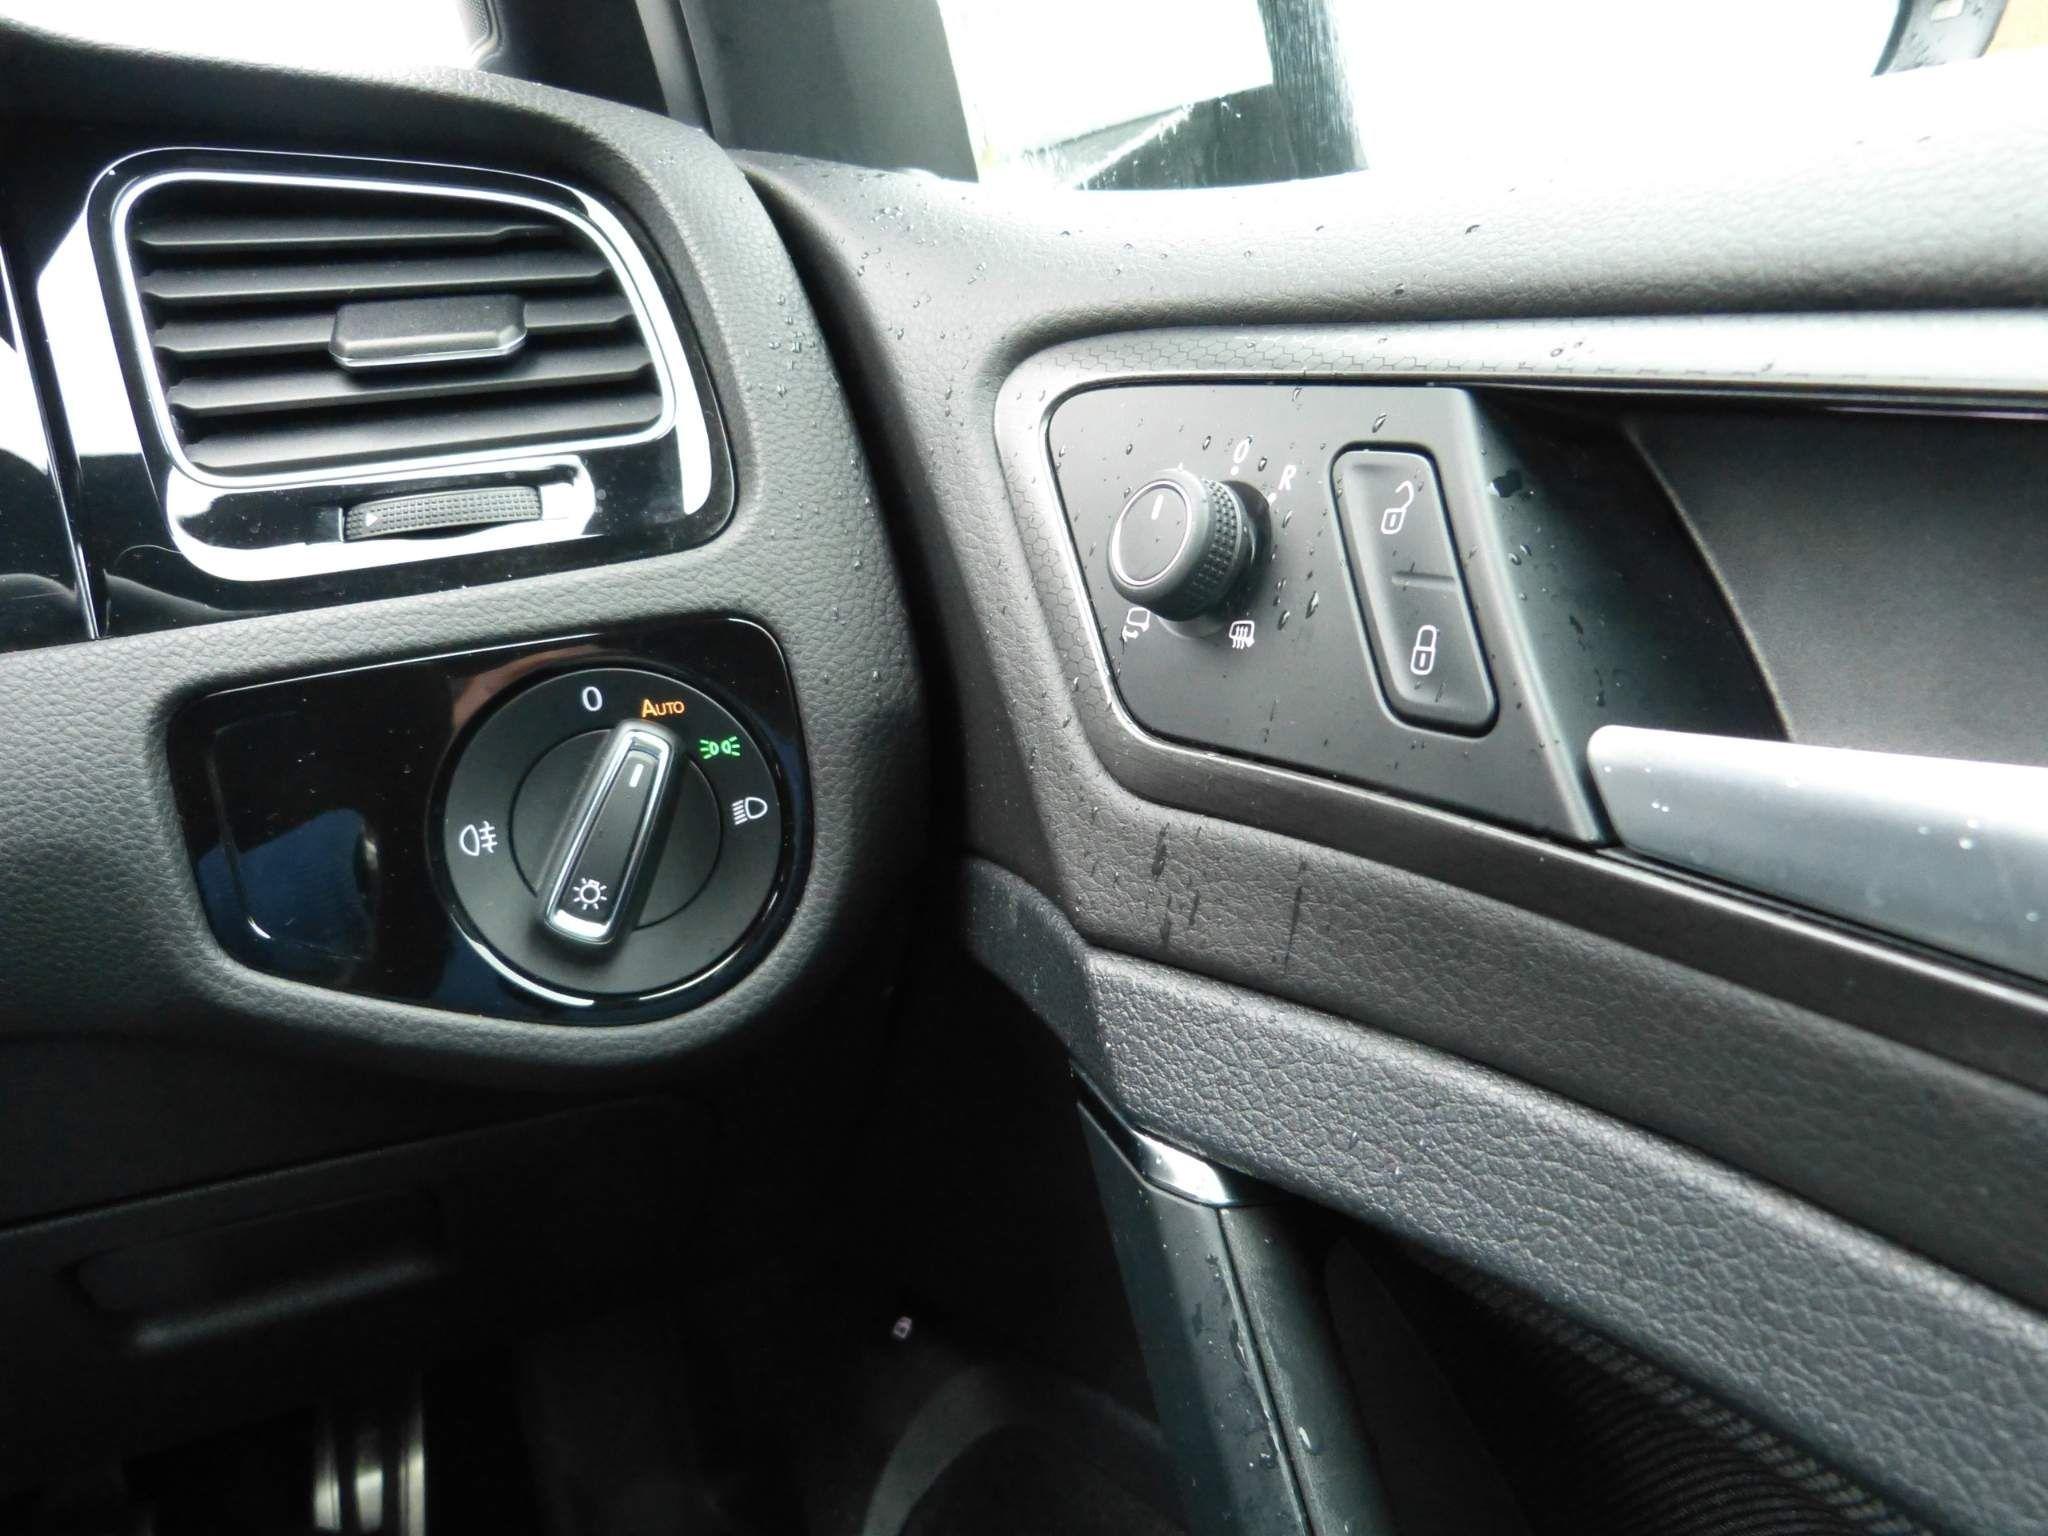 2018 VOLKSWAGEN Golf 1.4 TSI 8.7kWh GTE Advance DSG (s/s) Hybrid – Petrol/Electric Plug-in Automatic  – Beechlawn Motors Belfast full